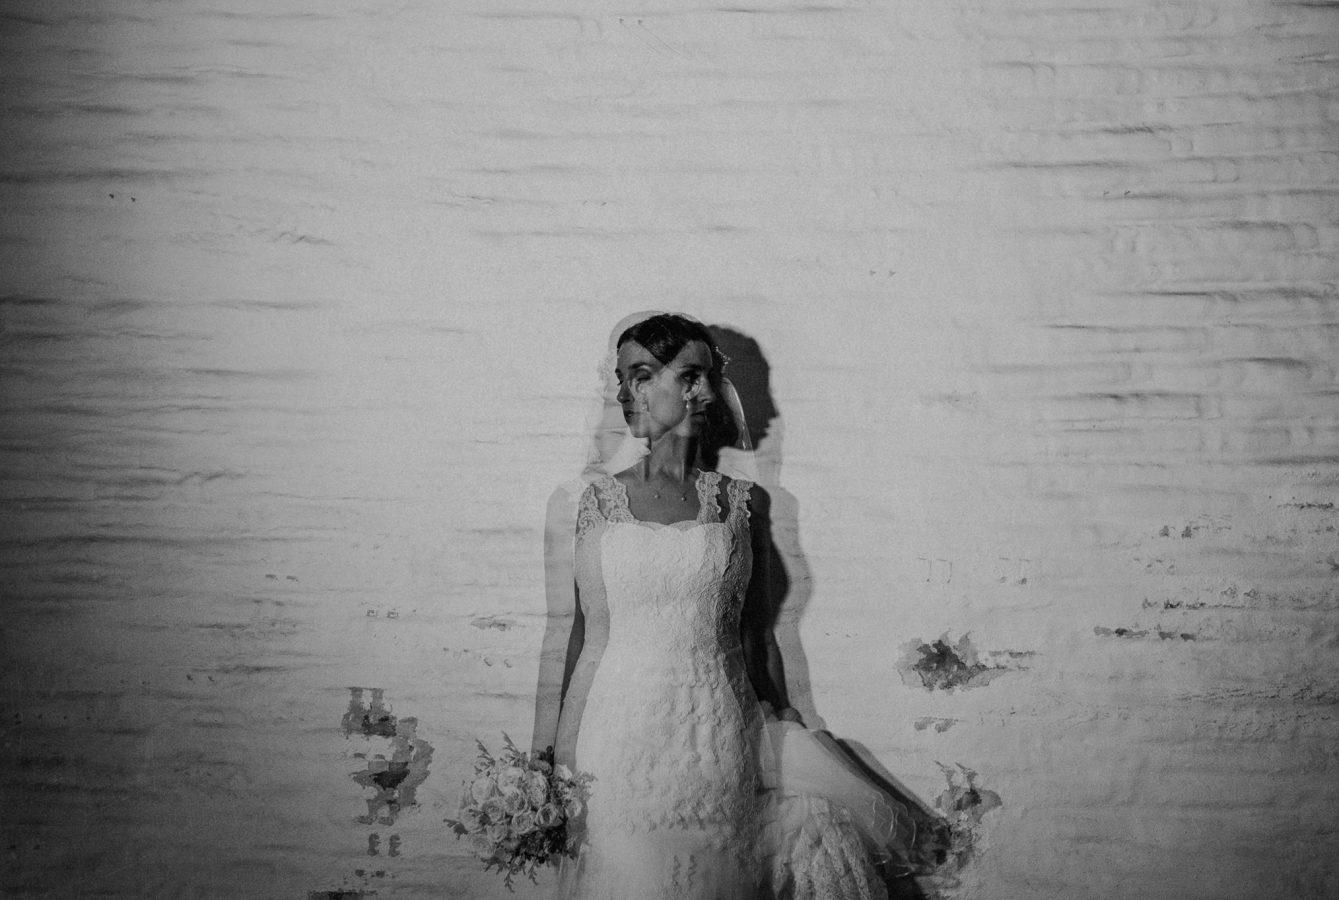 fotografia-de-boda-alternativa